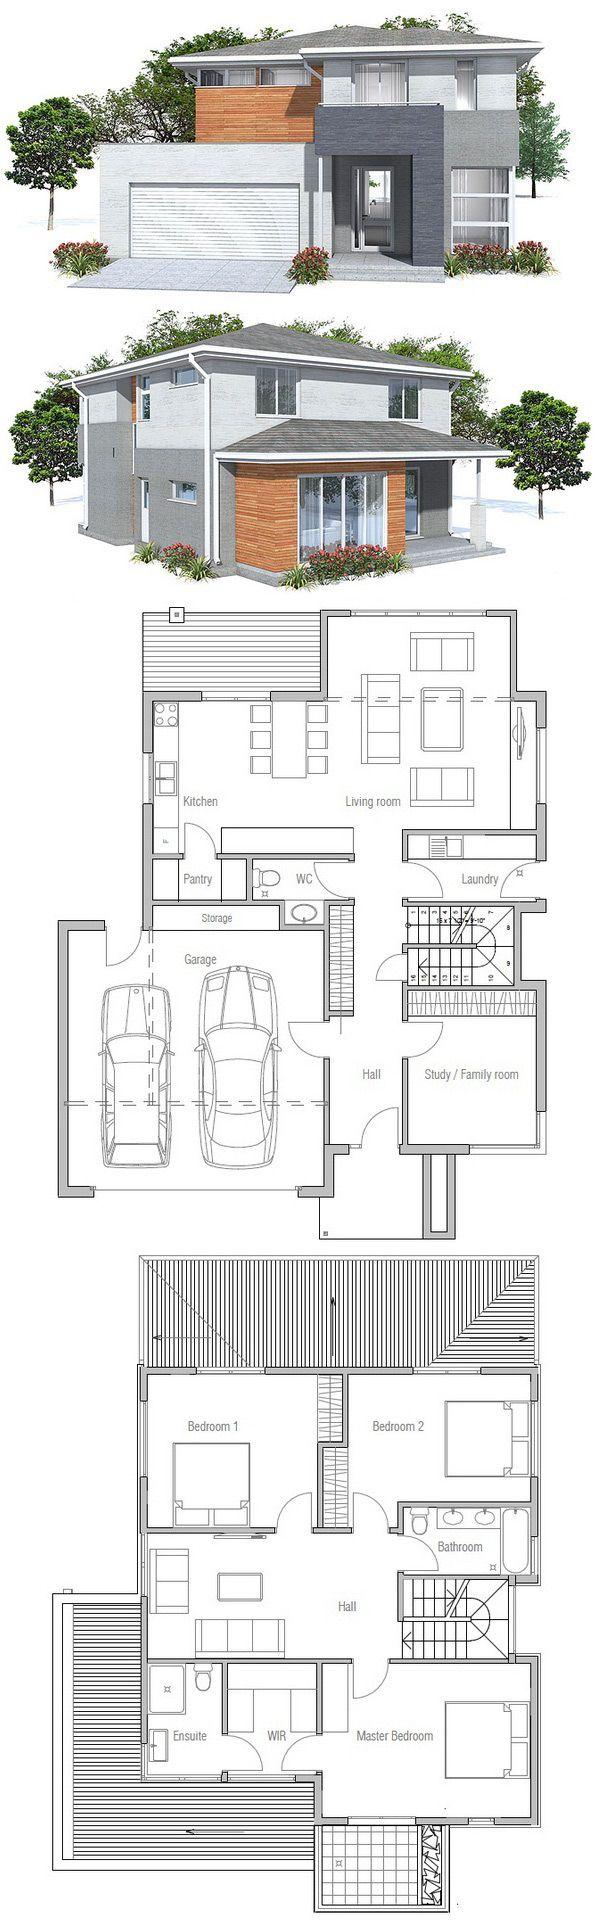 house plans home plans house plans house designs